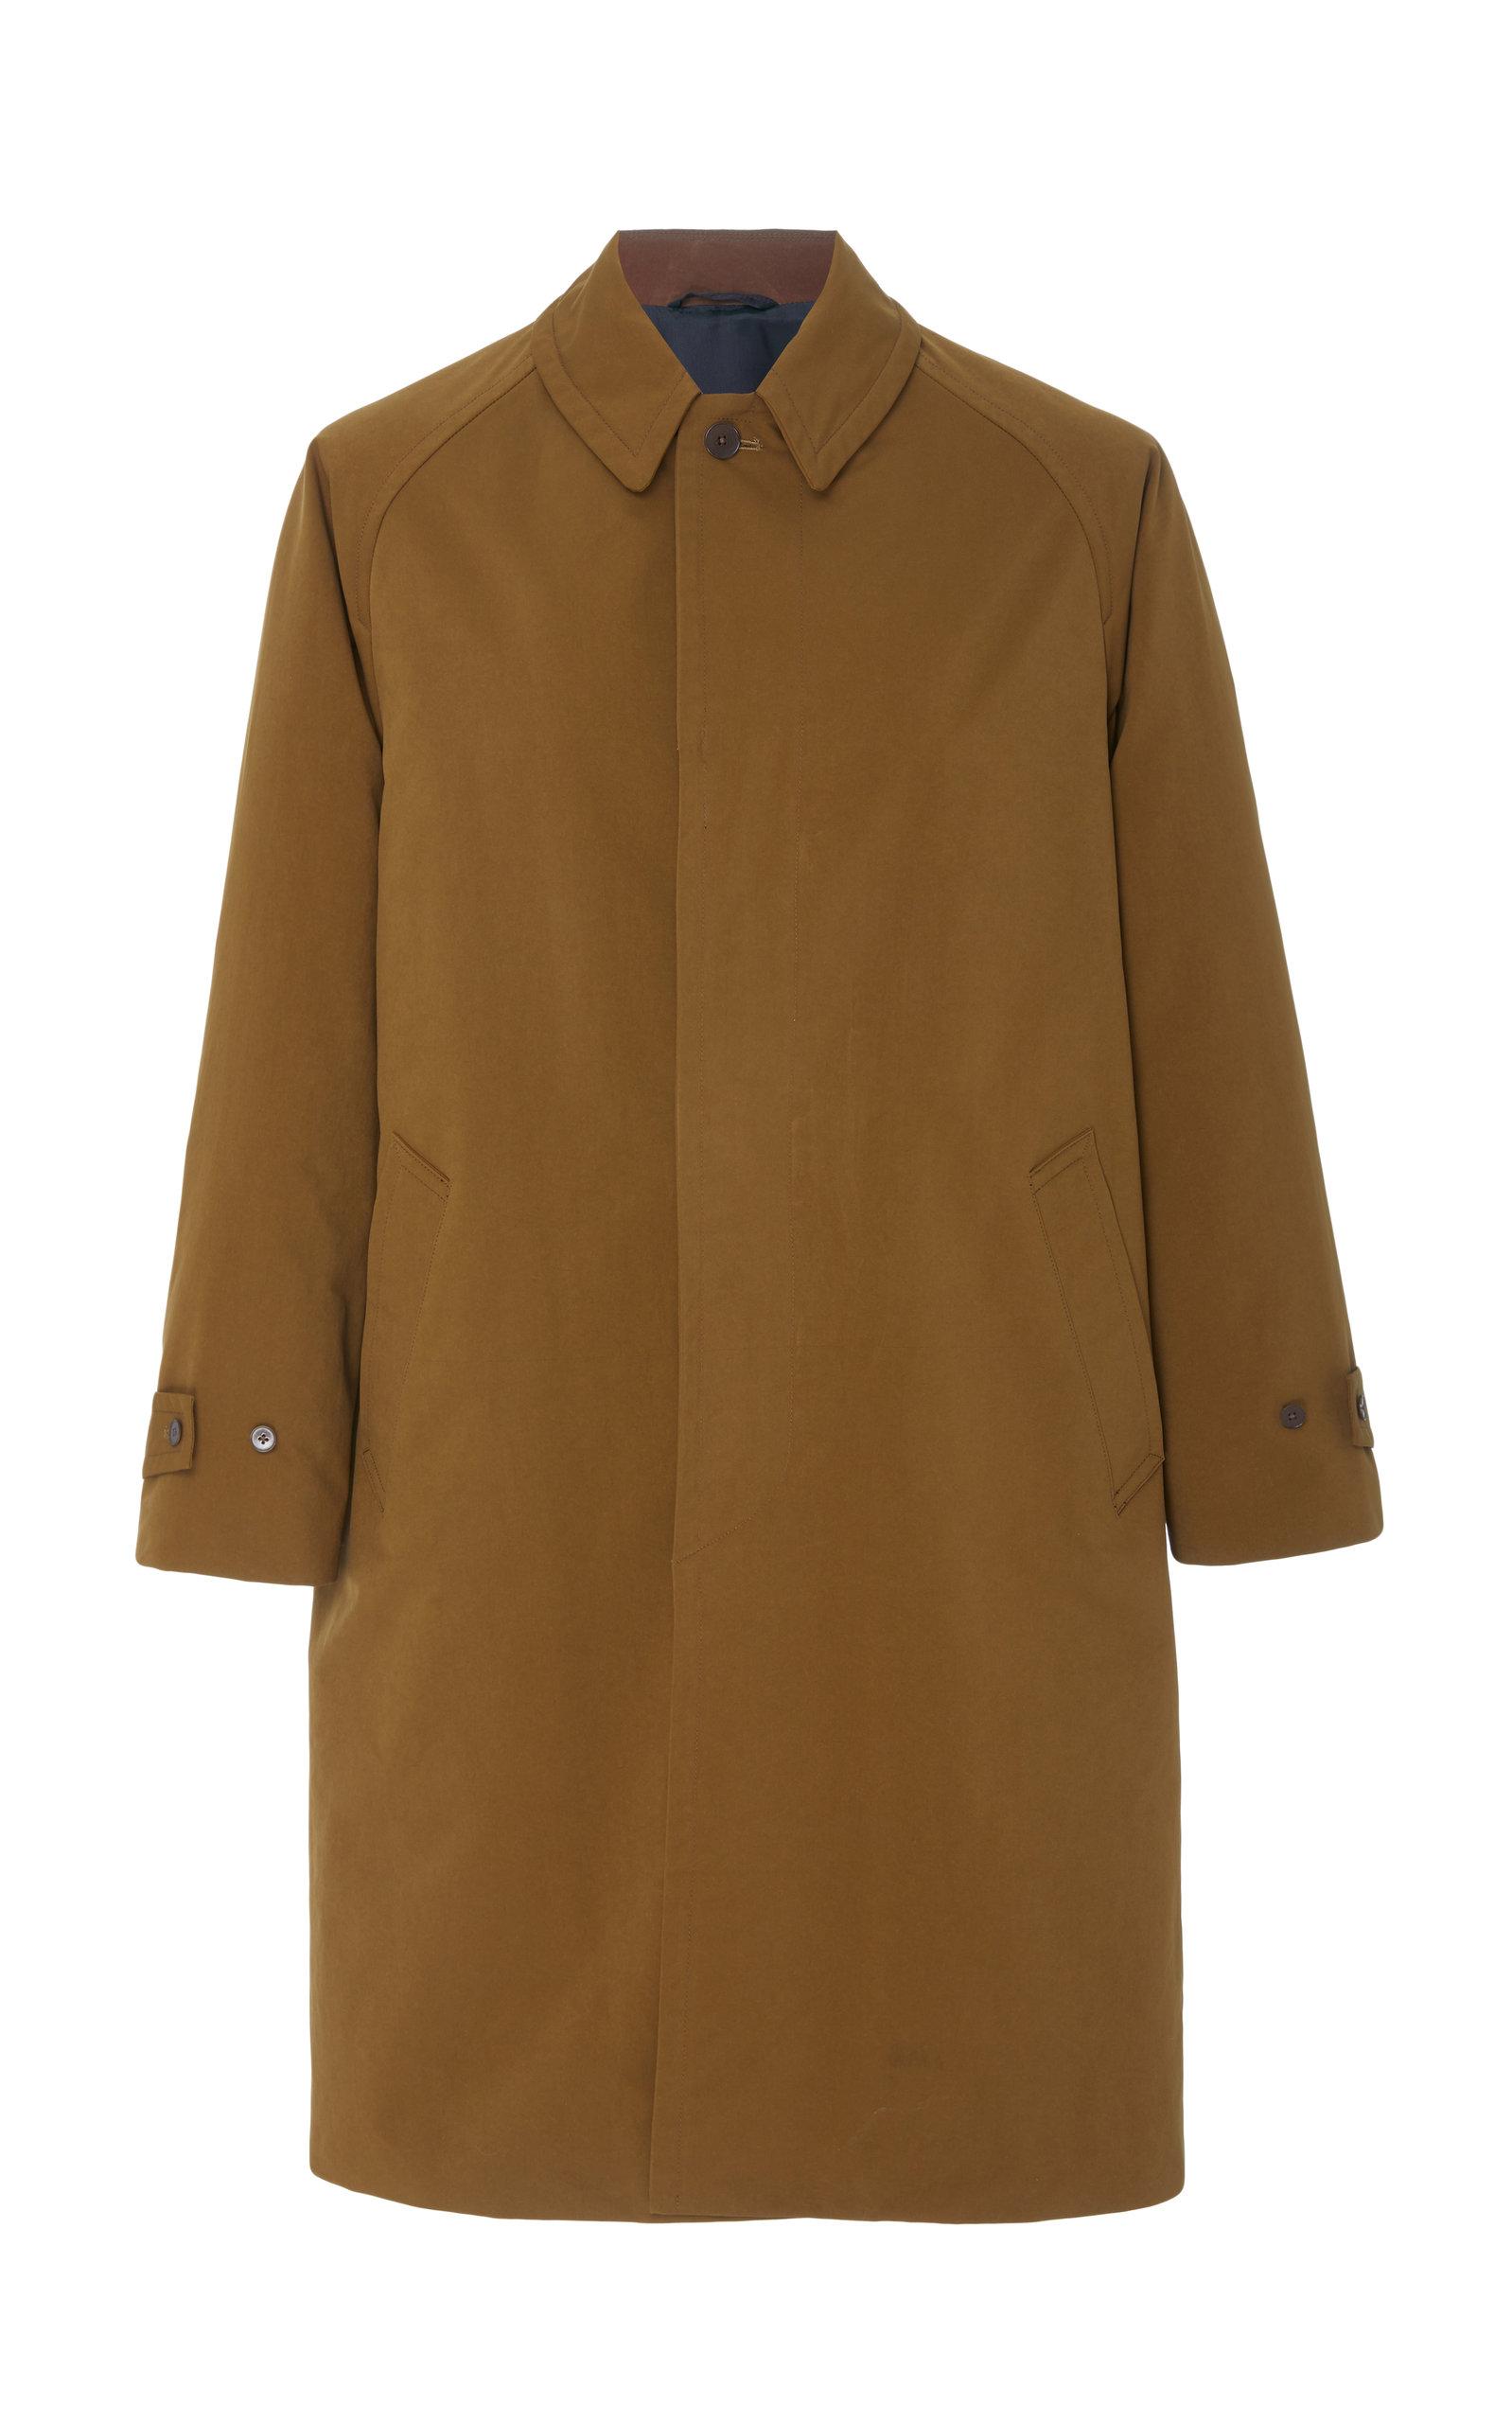 CAMOSHITA Raglan Coat in Brown